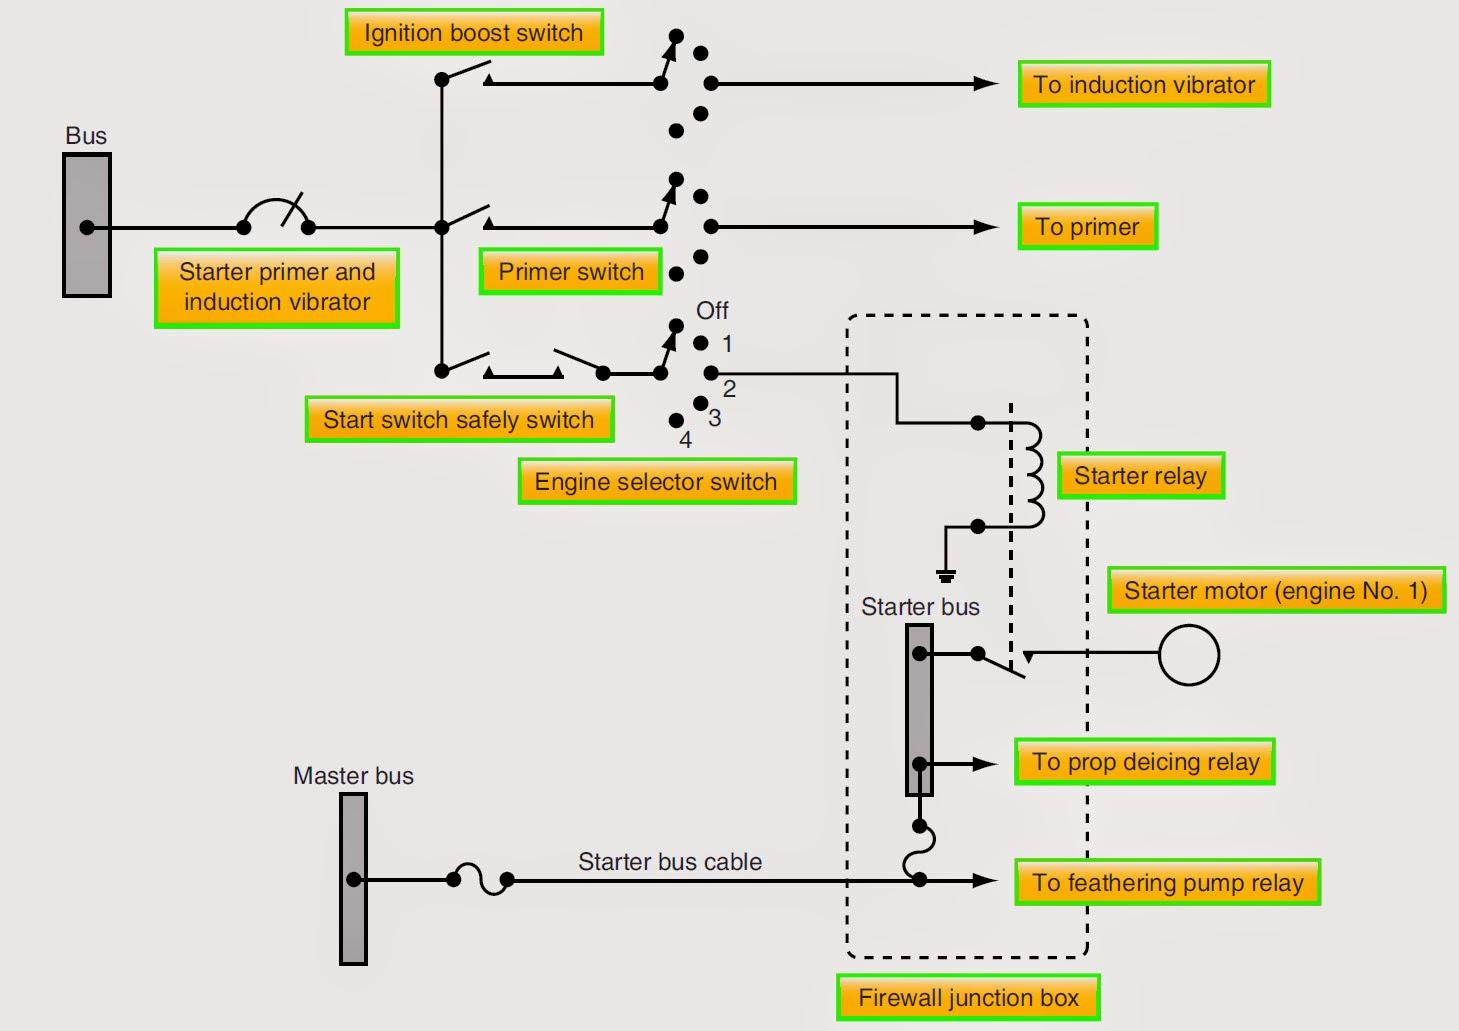 magneto wiring diagram 2000 silverado radio experimental aircraft alternator